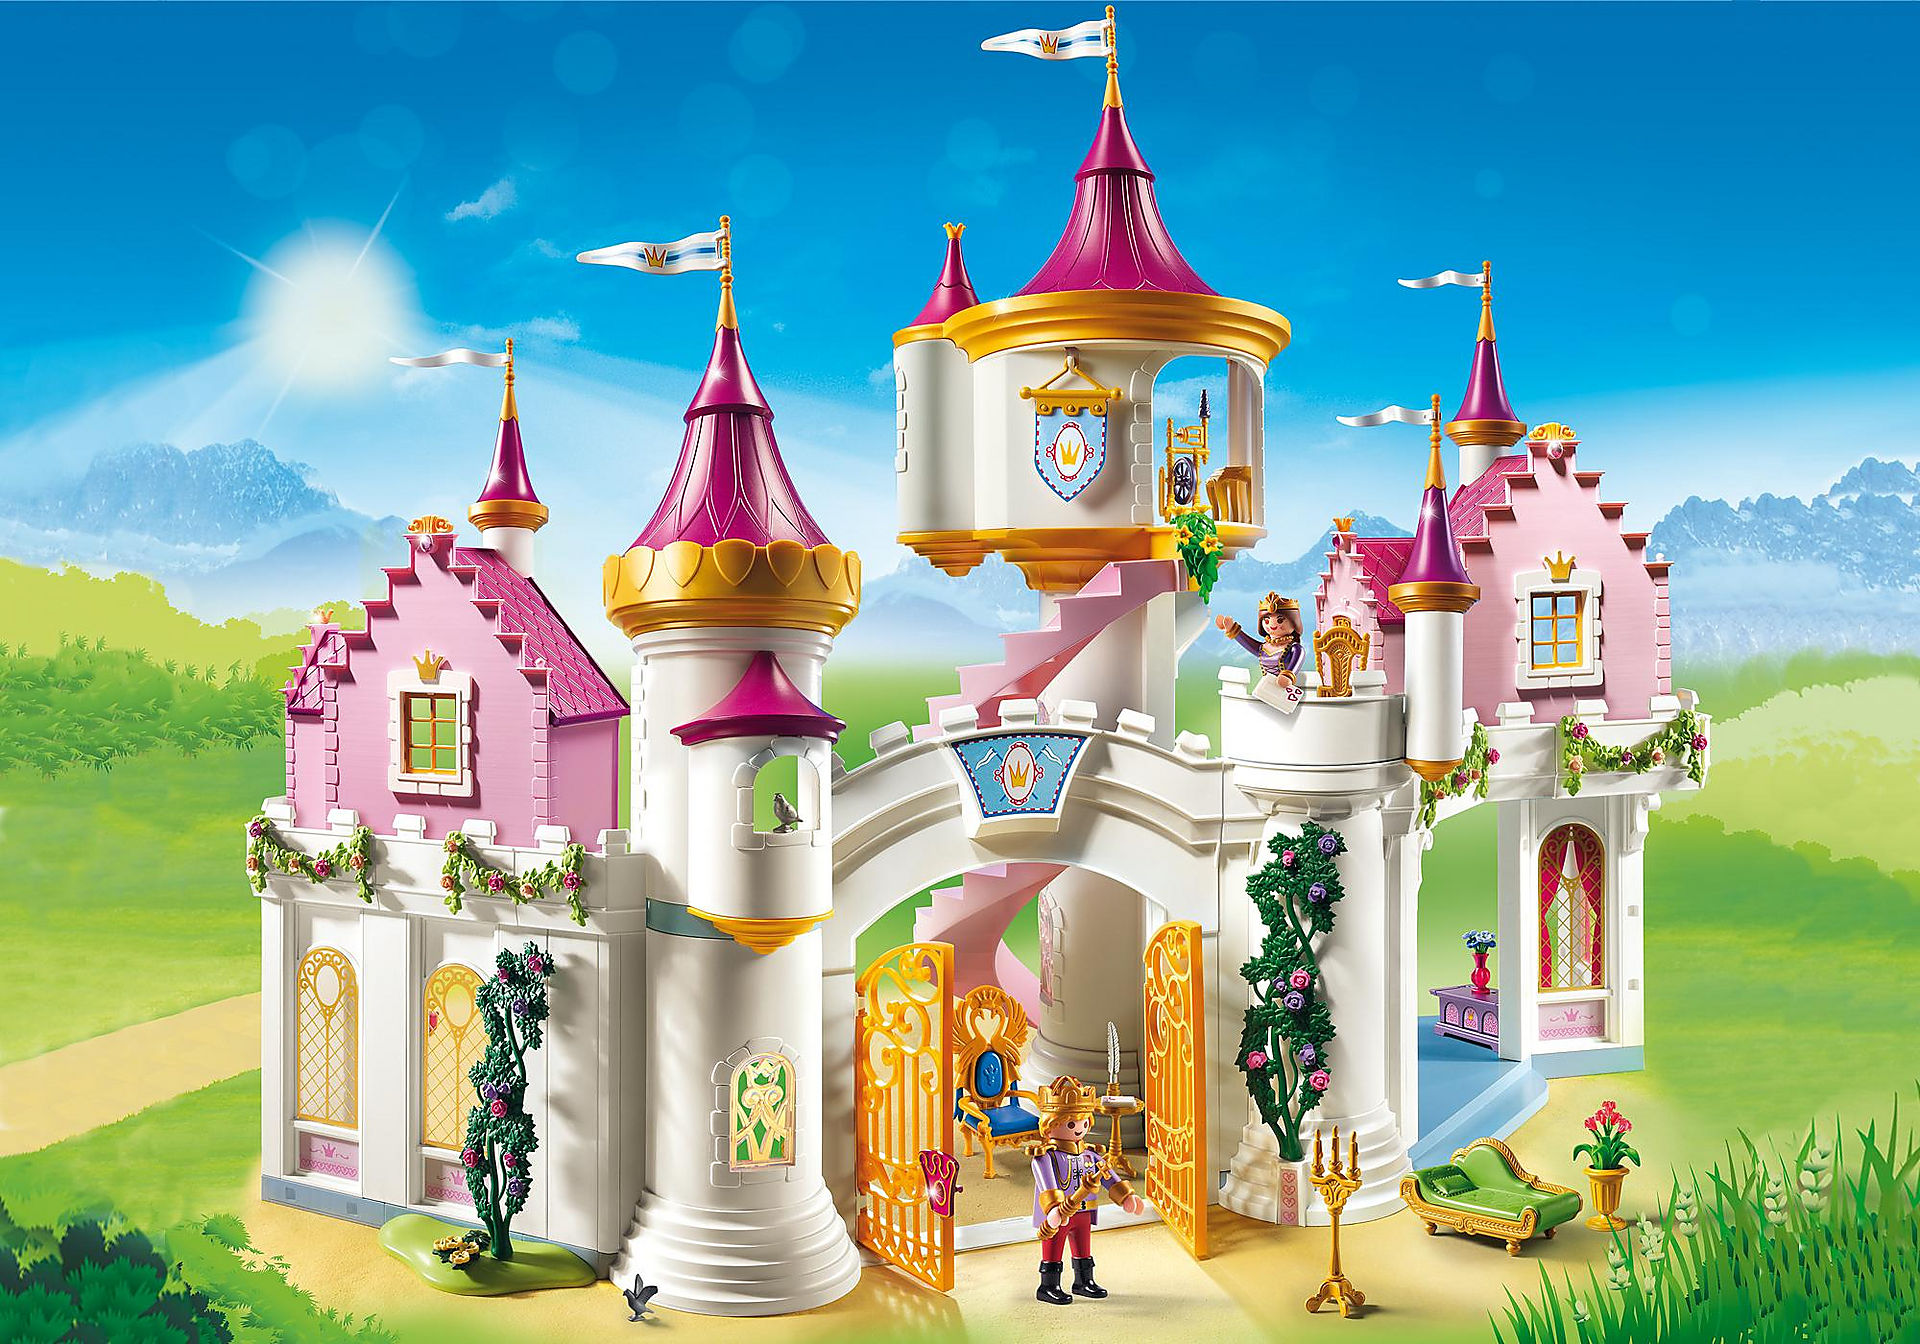 6848 Prinzessinnenschloss zoom image1